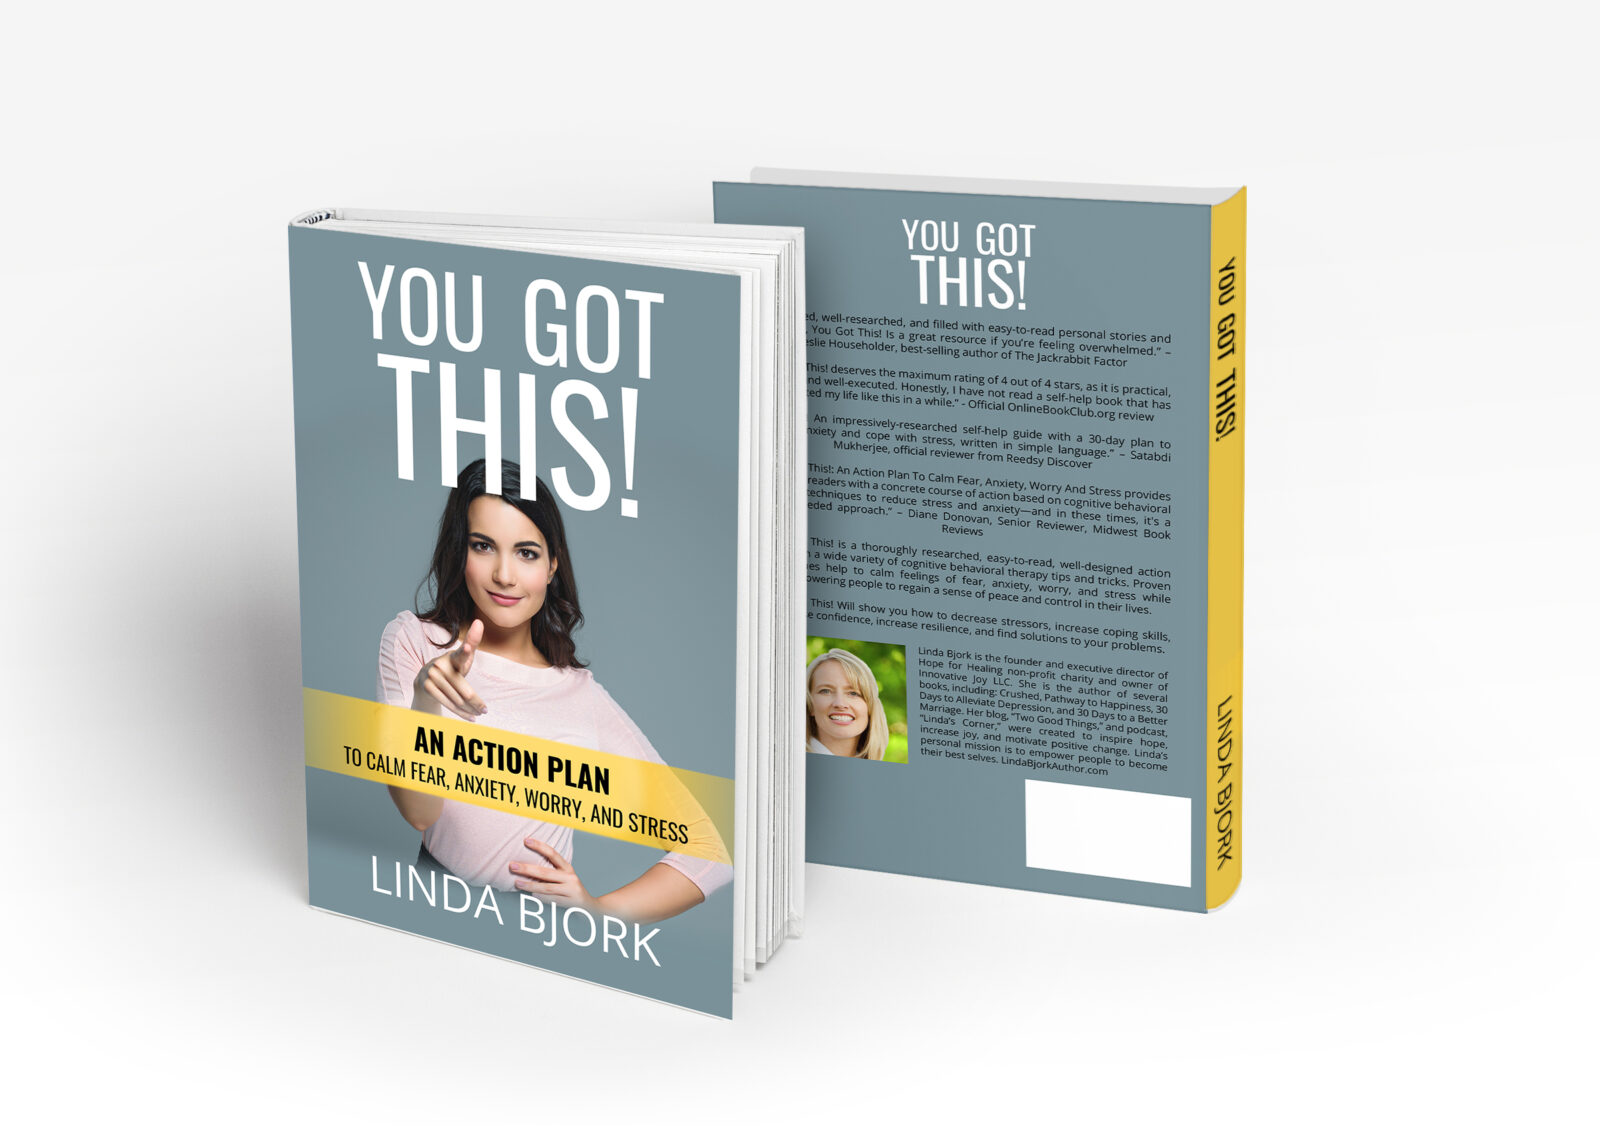 You got this by linda bjork